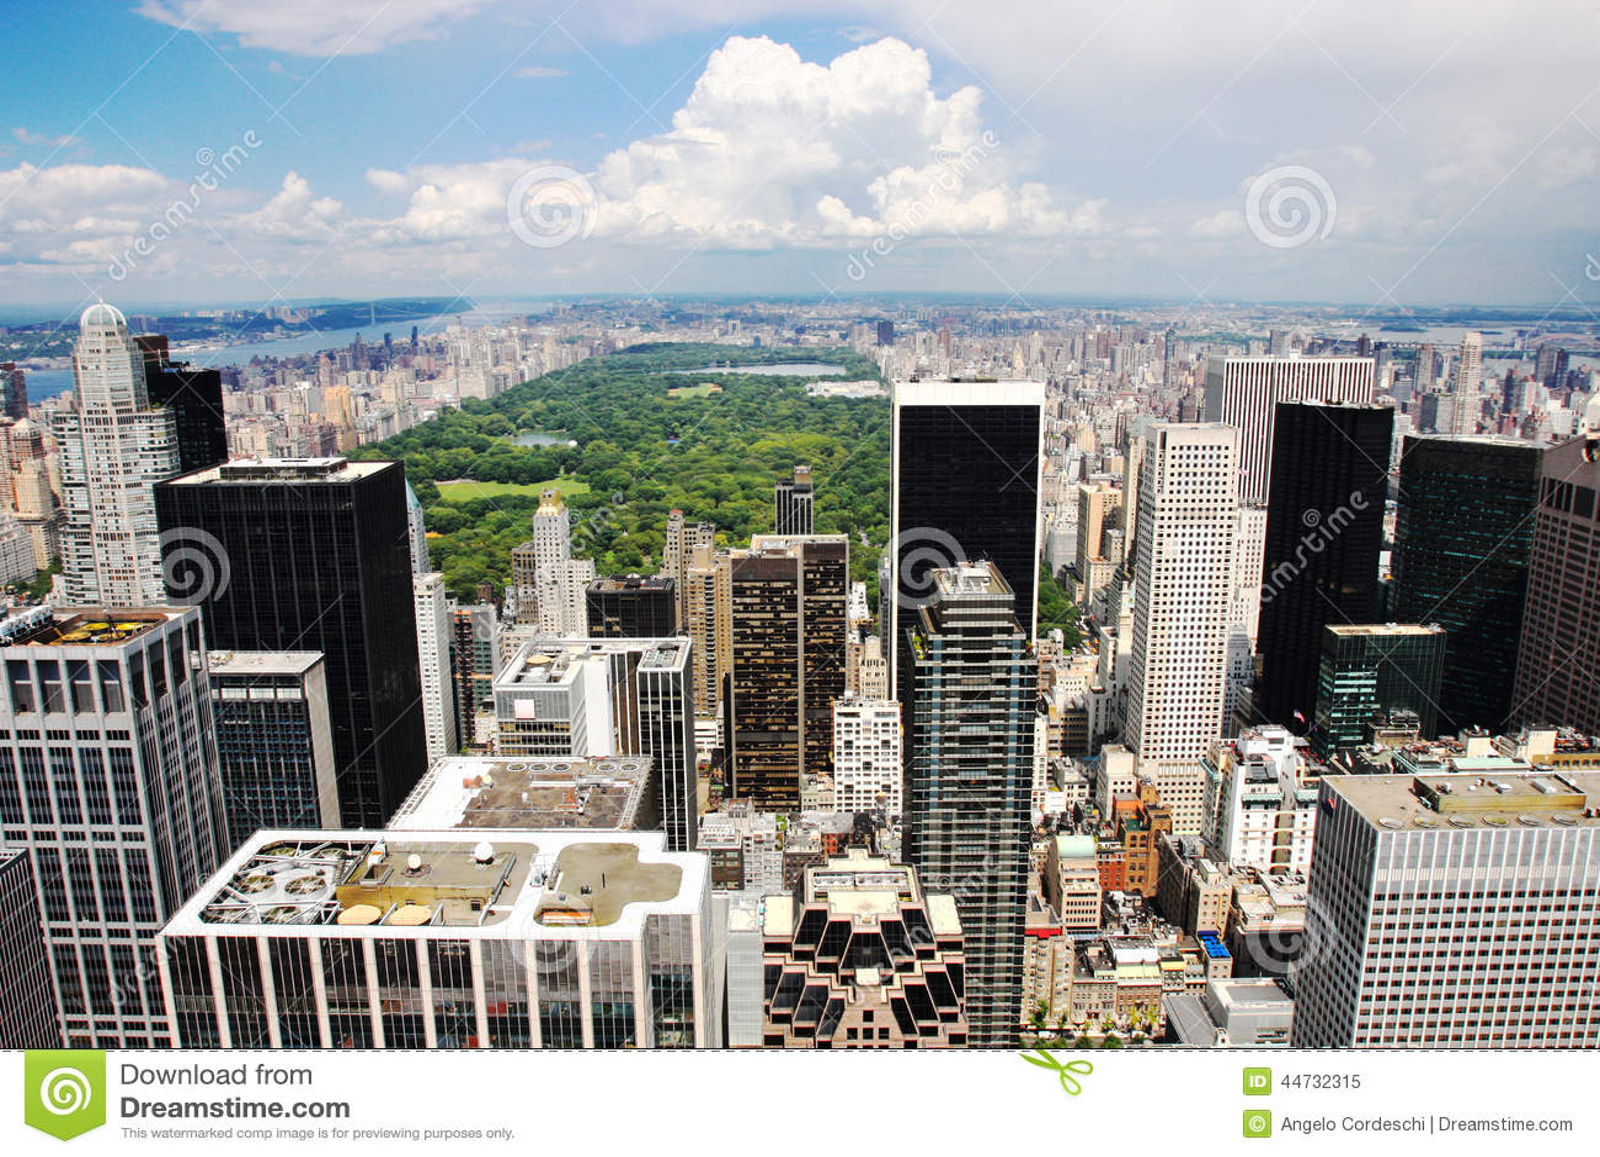 Empire State Building New York Manhattan Usa Stock